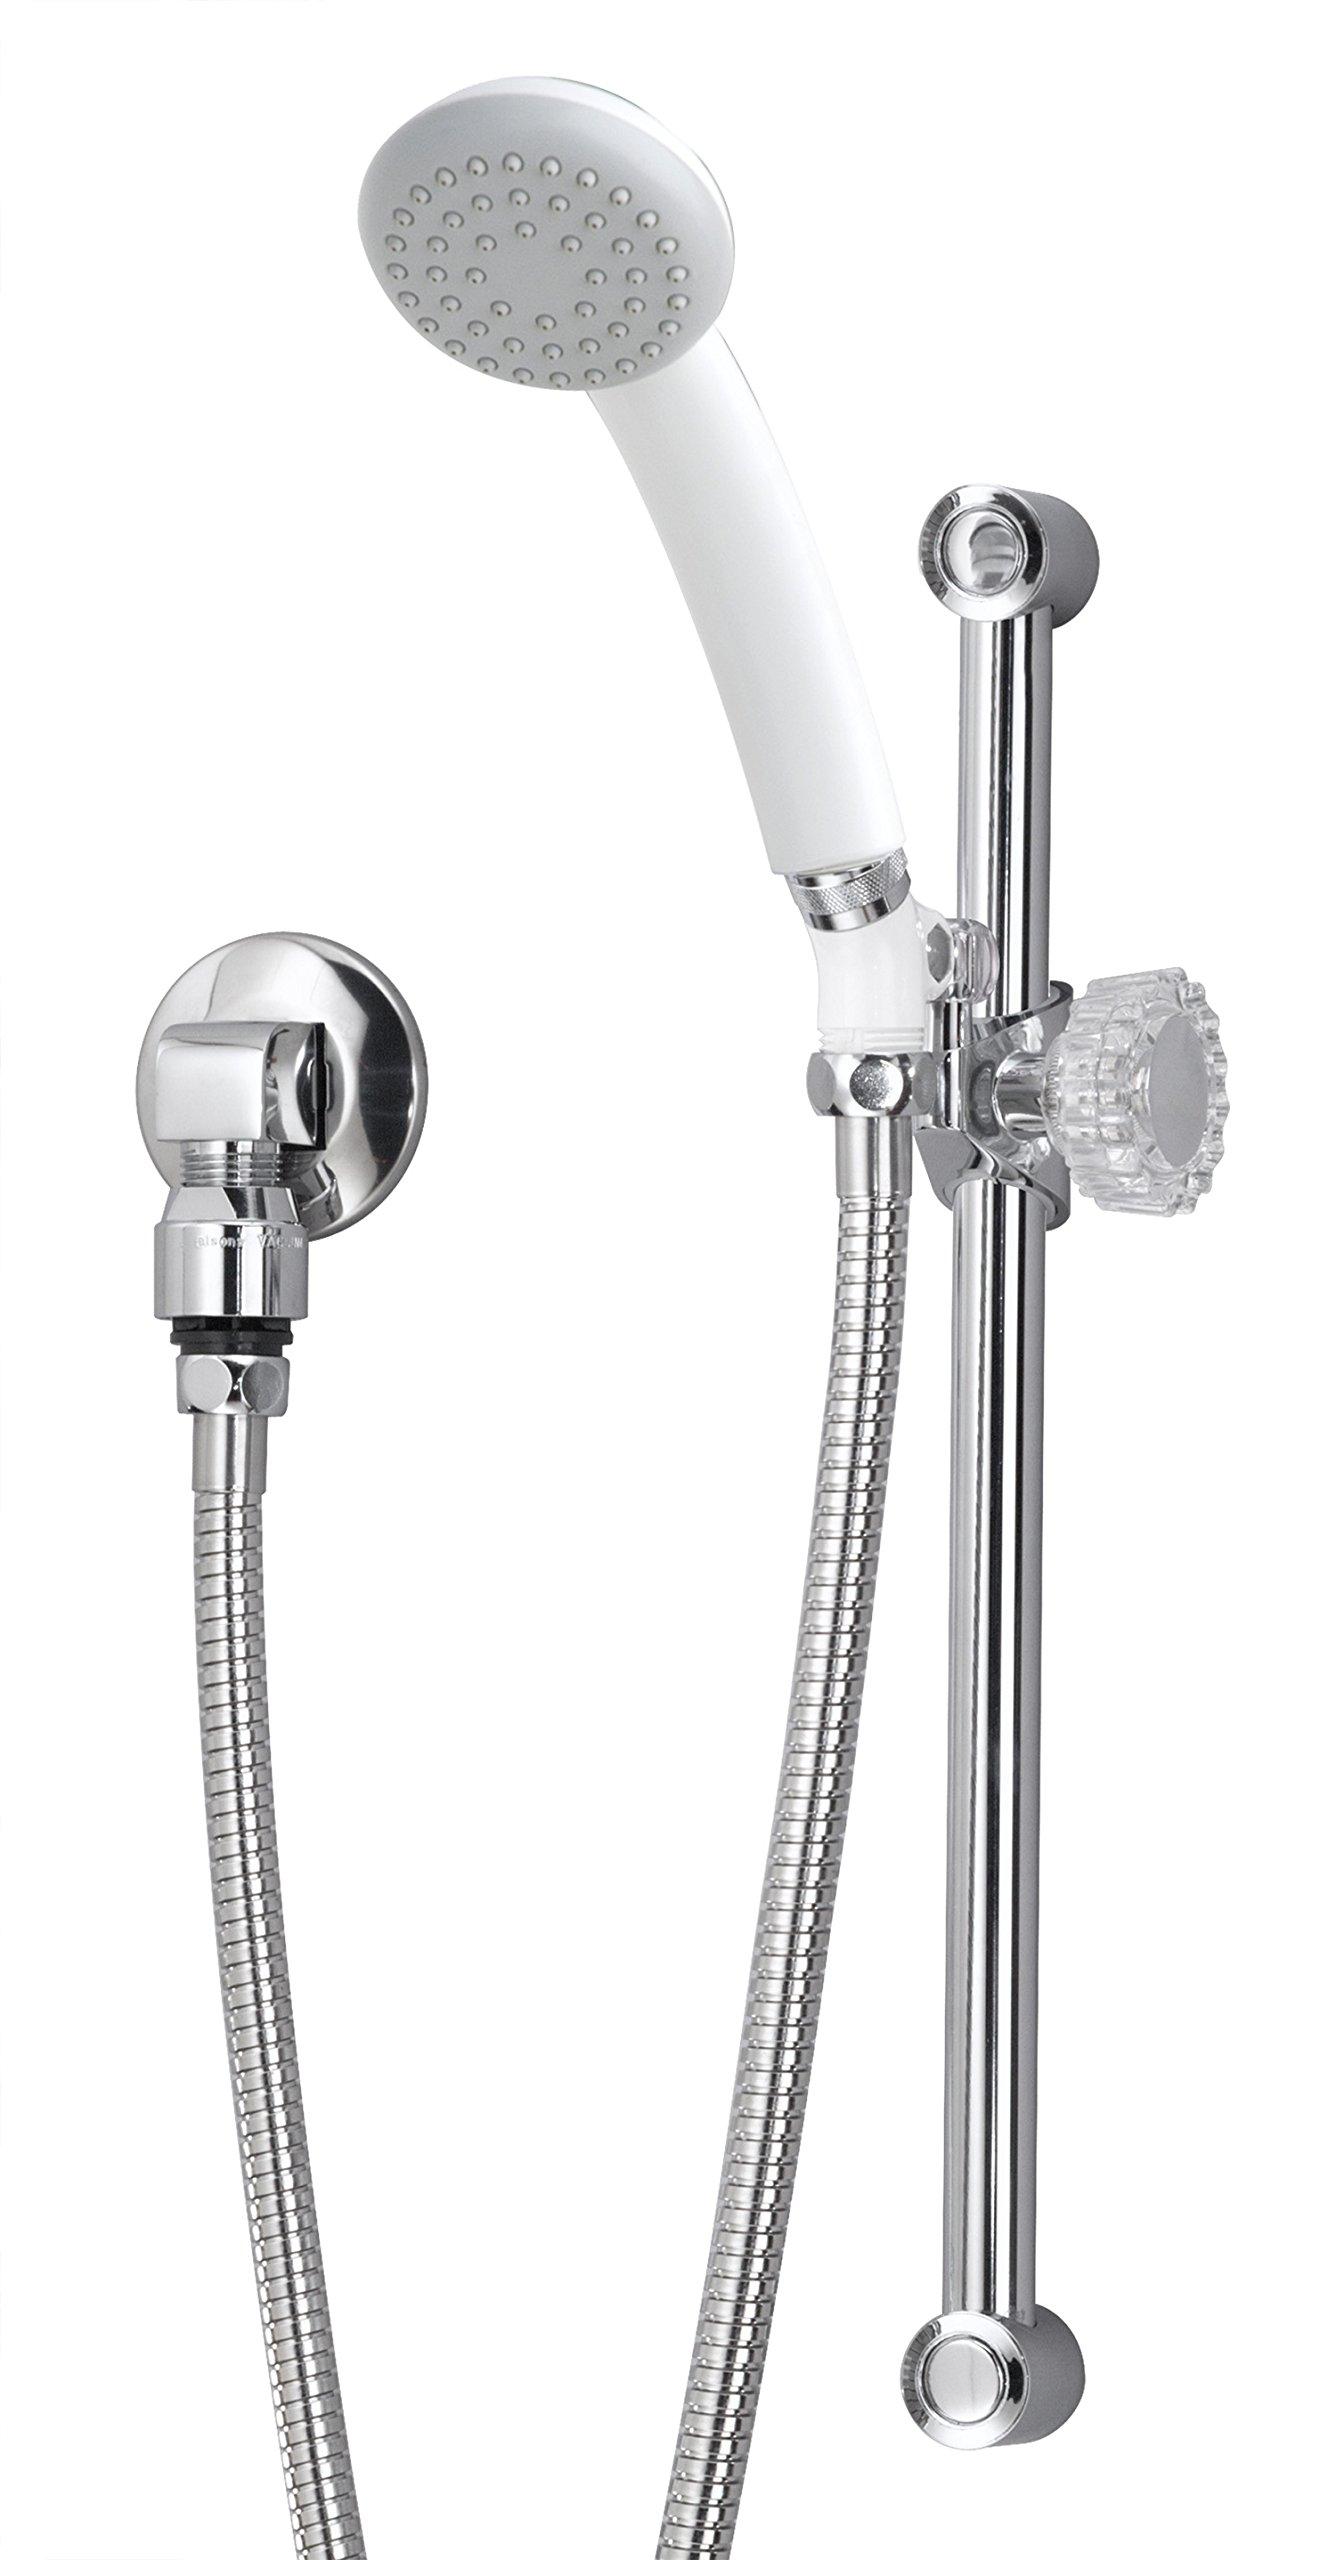 Symmons T-300B-30-V Wall/Hand Shower and Slide Bar